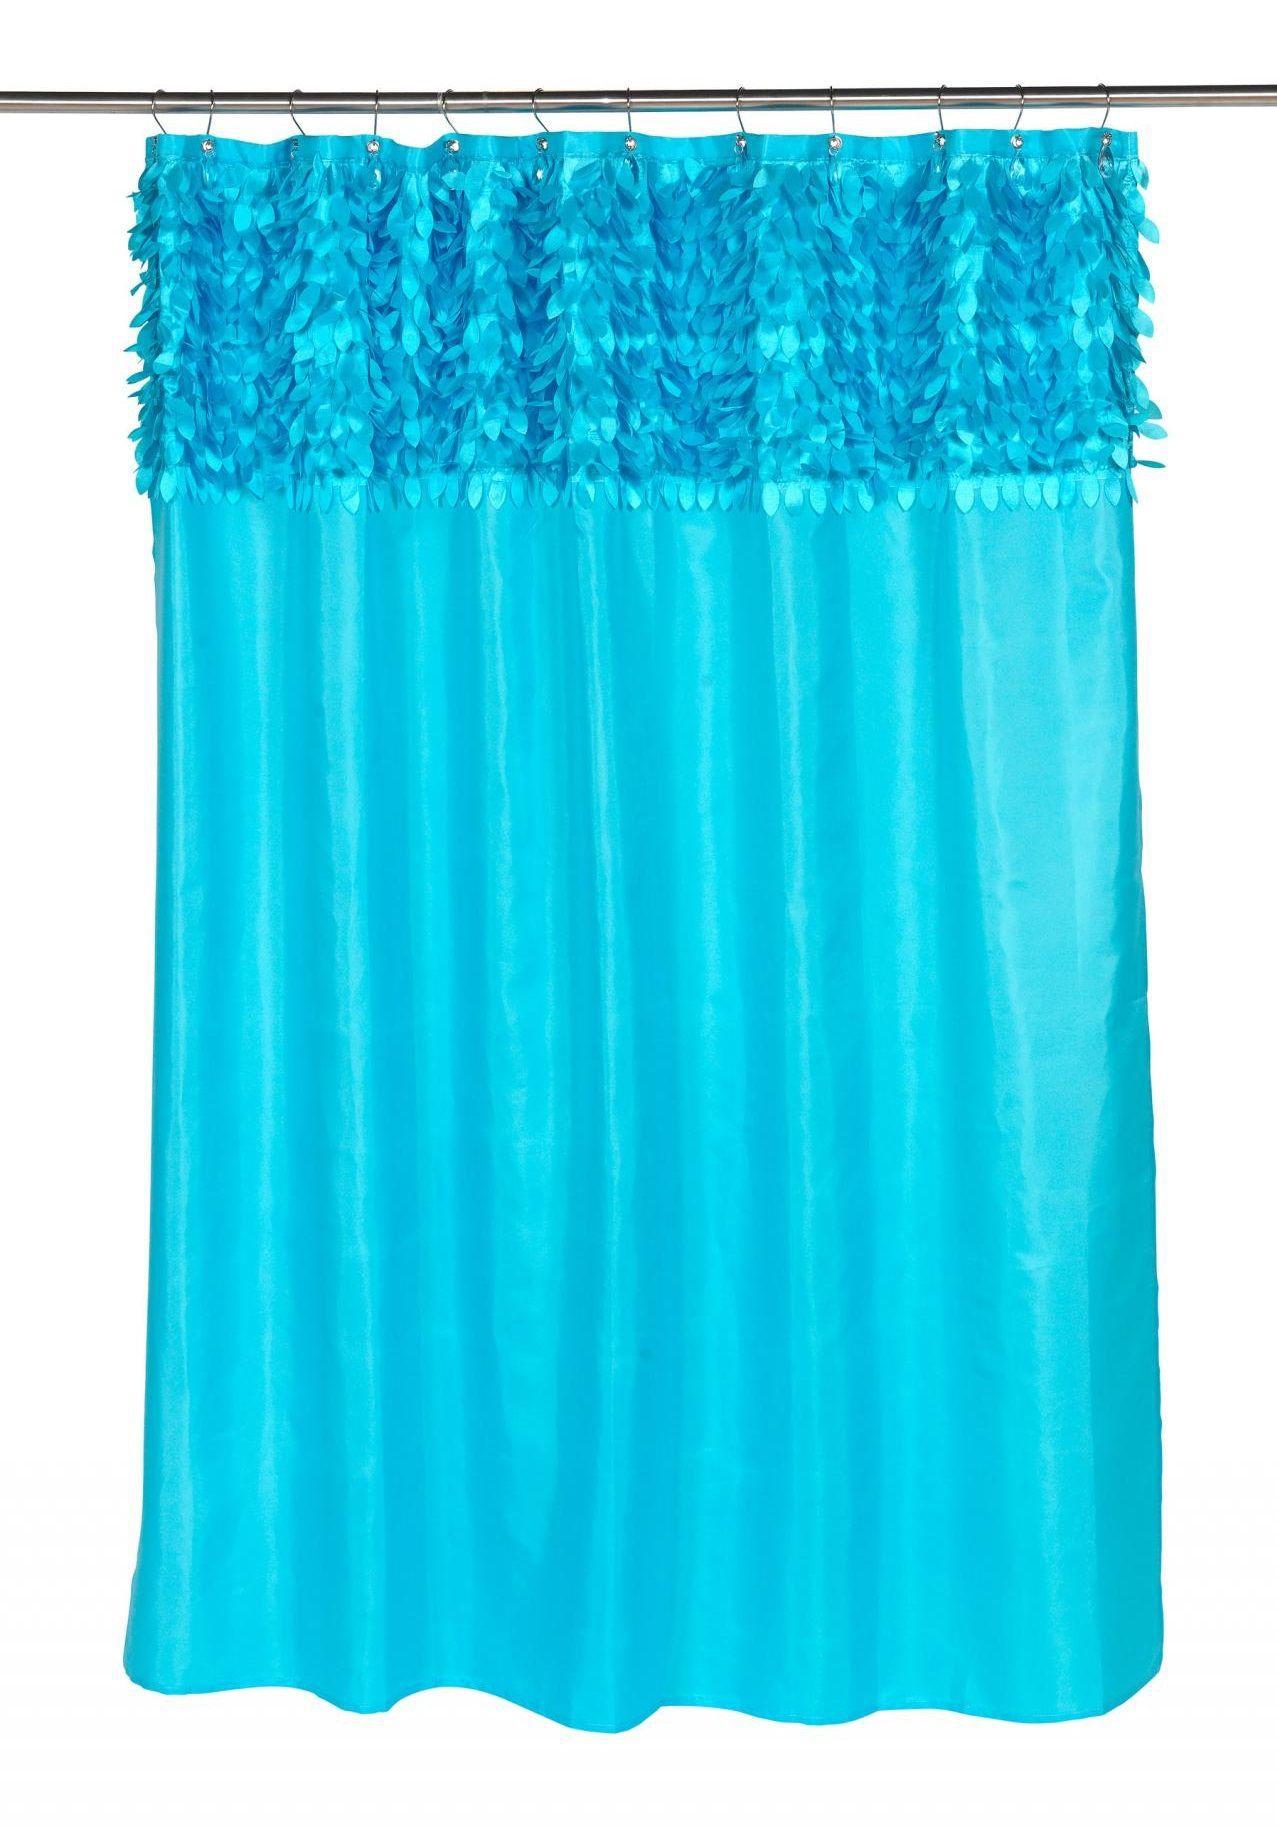 Шторки Шторка для ванной 178x183 Carnation Home Fashions Jasmine Cyan Blue elitnaya-shtorka-dlya-vannoy-jasmine-cyan-blue-ot-carnation-home-fashions-ssha-kitay.jpg